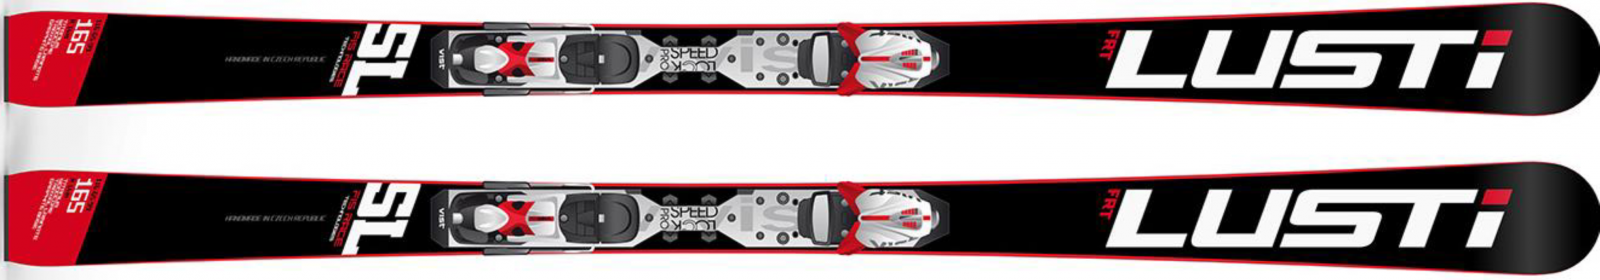 FIS RT SL (FIS race technologies SL)